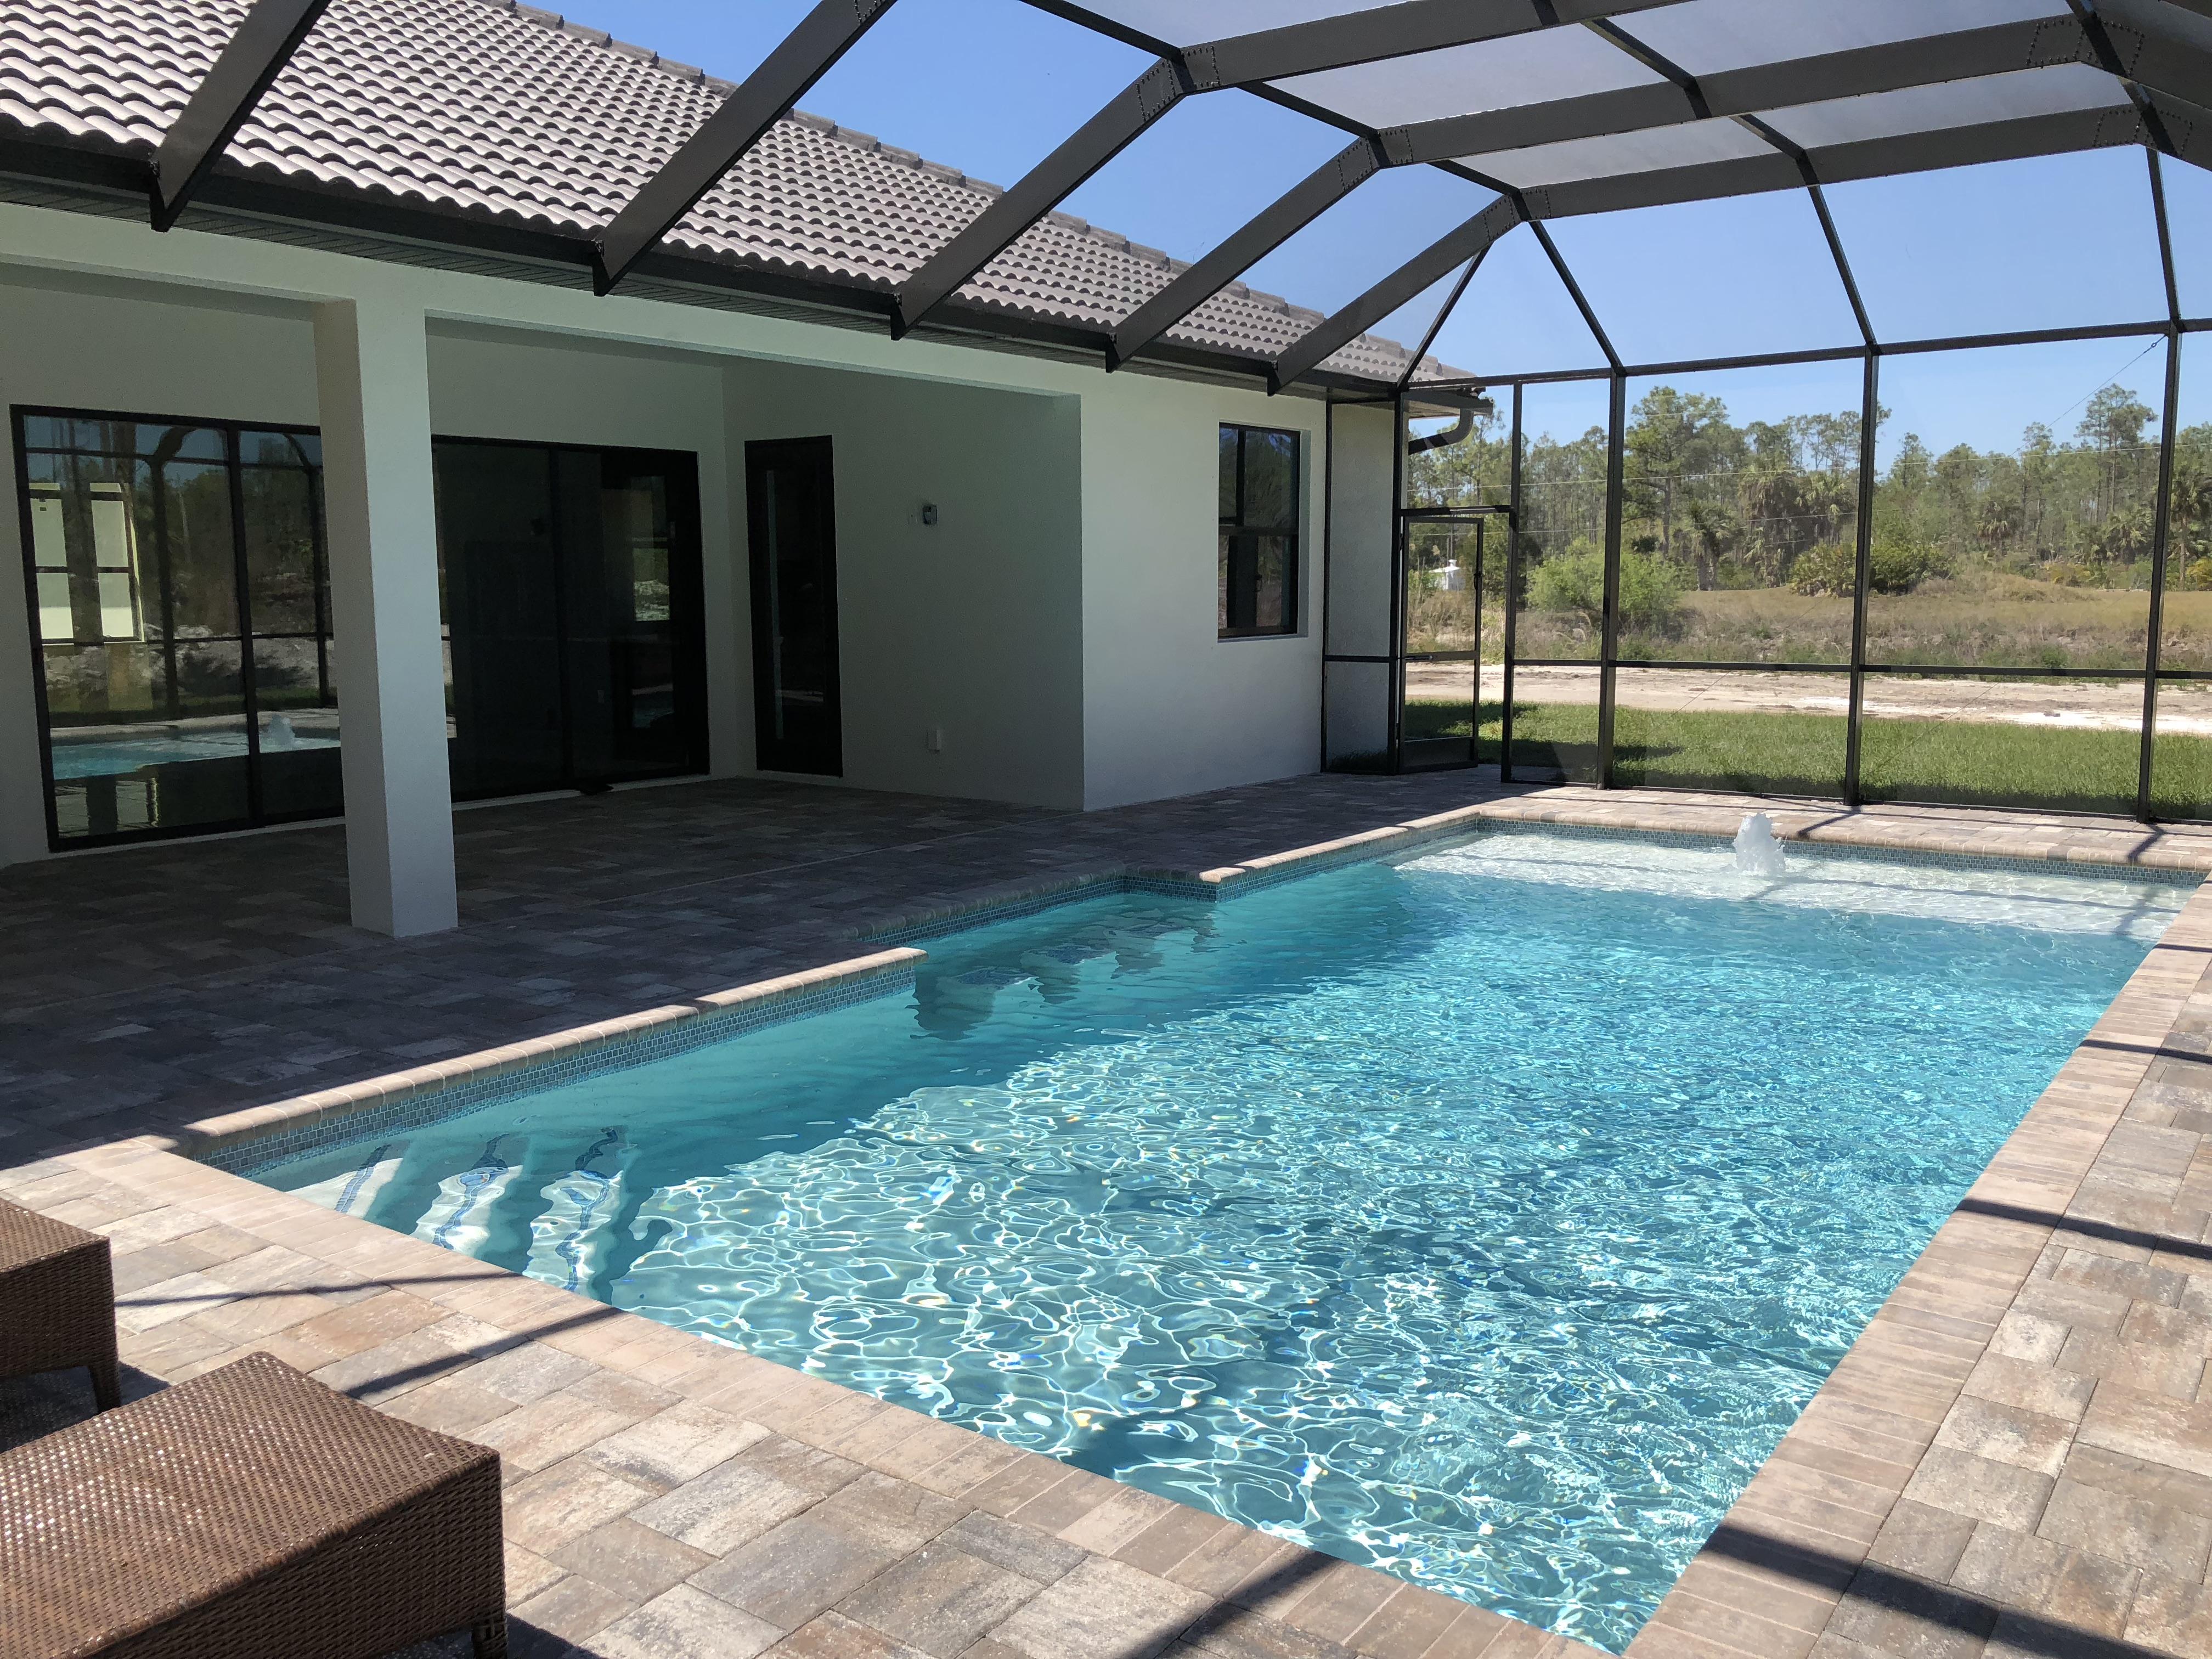 Marquesa Custom exterior pool deck